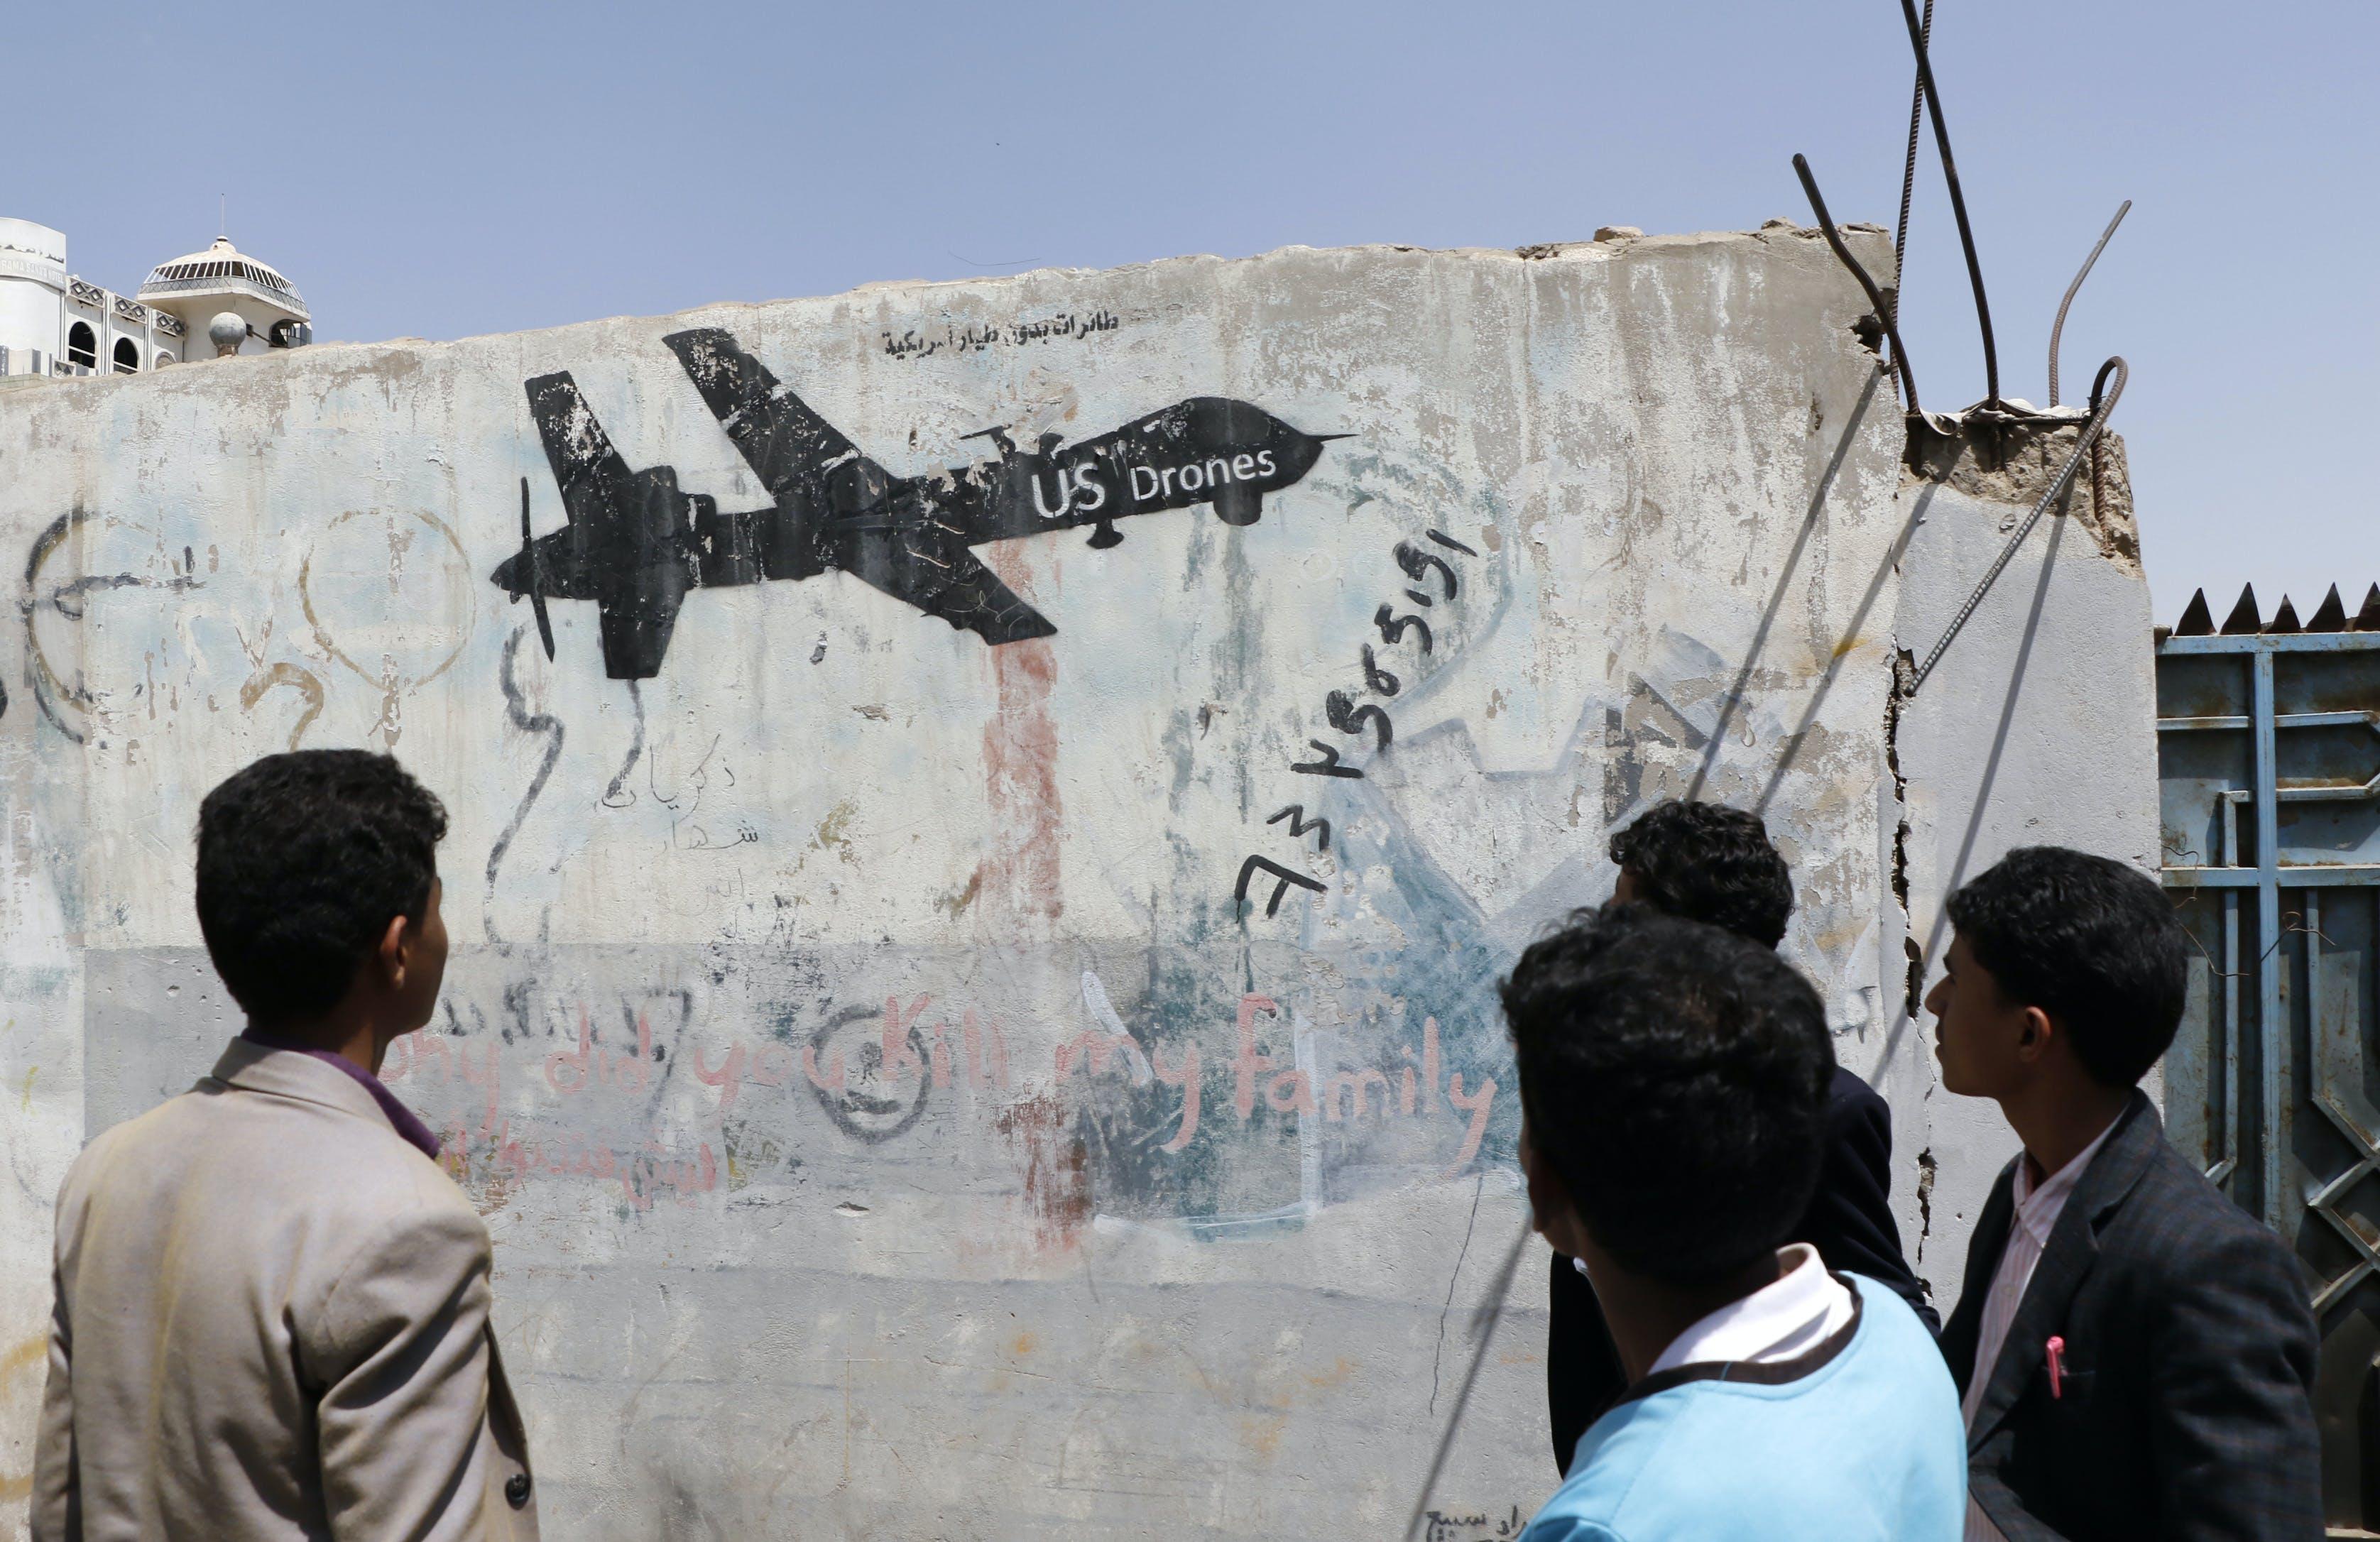 A Yemeni man looks at graffiti protesting against US drone strikes on September 19, 2018 in Sana'a, Yemen.